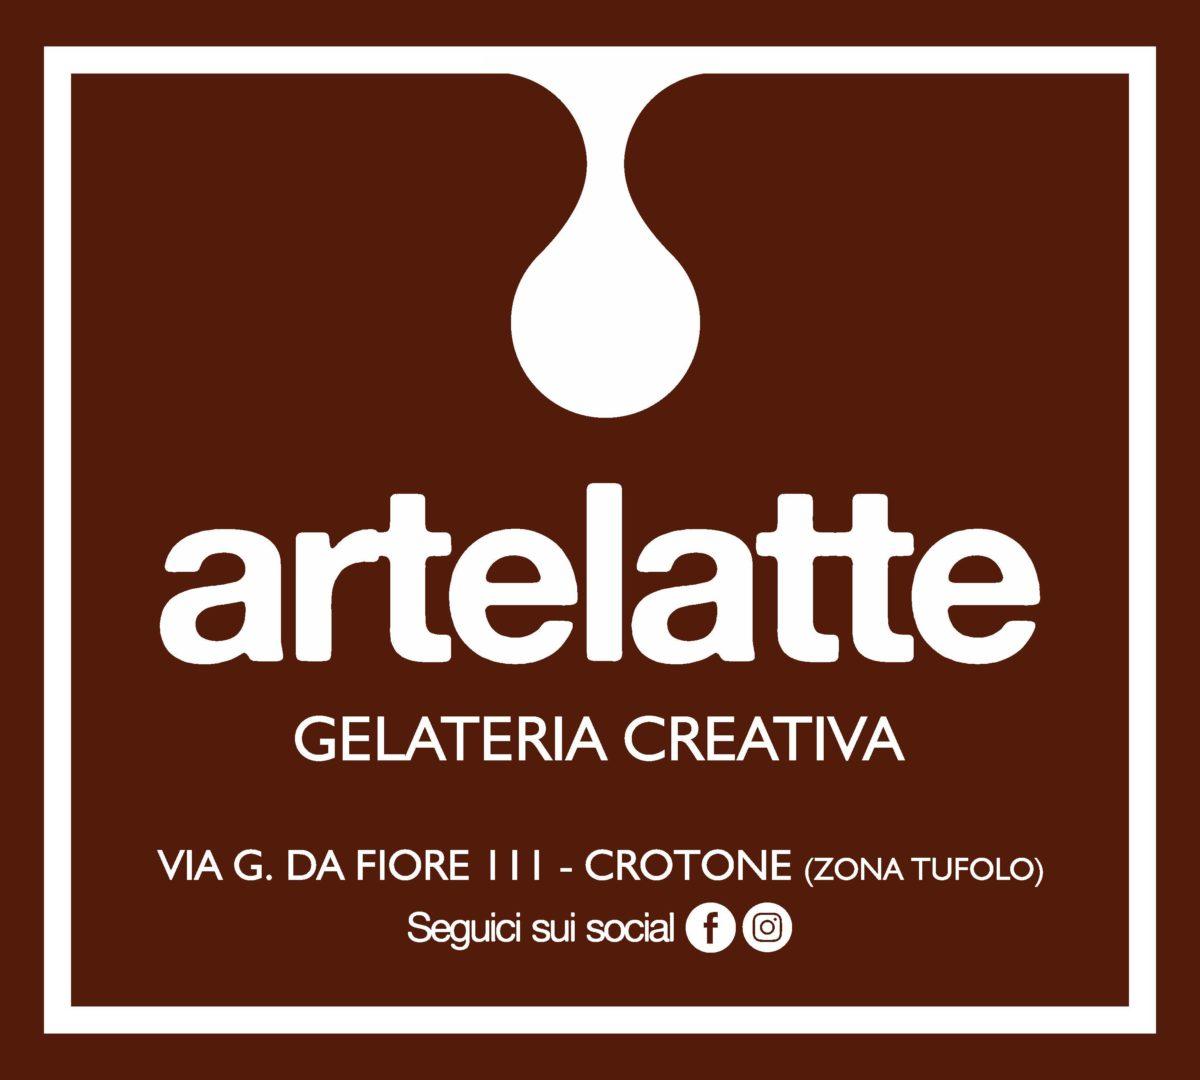 Artelatte